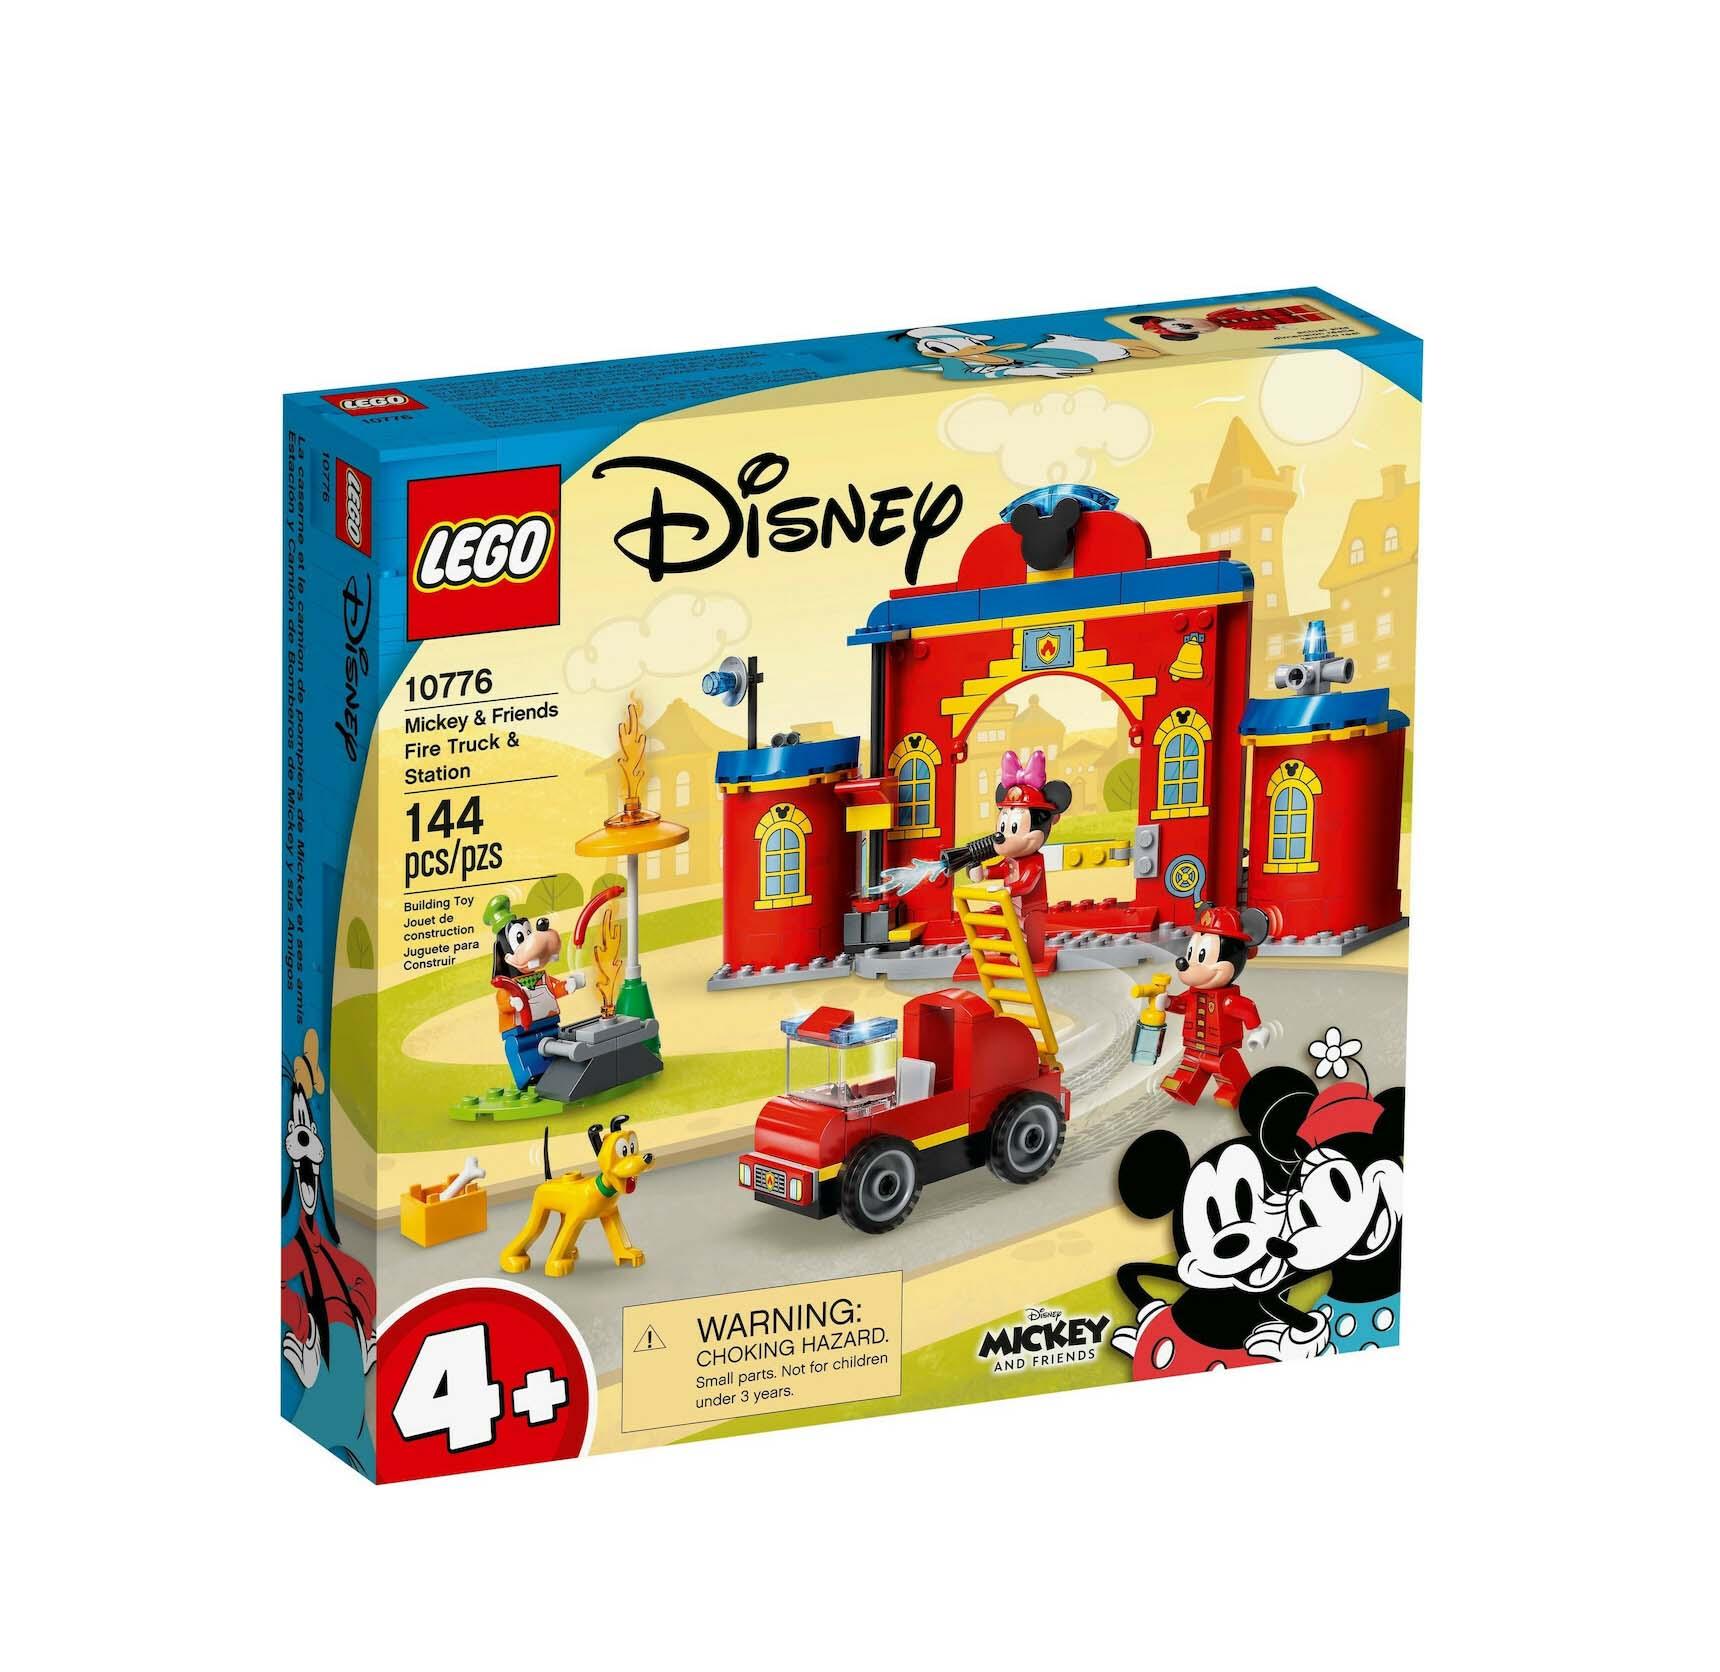 Lego Disney: Mickey & Friends Fire Truck & Station 10776